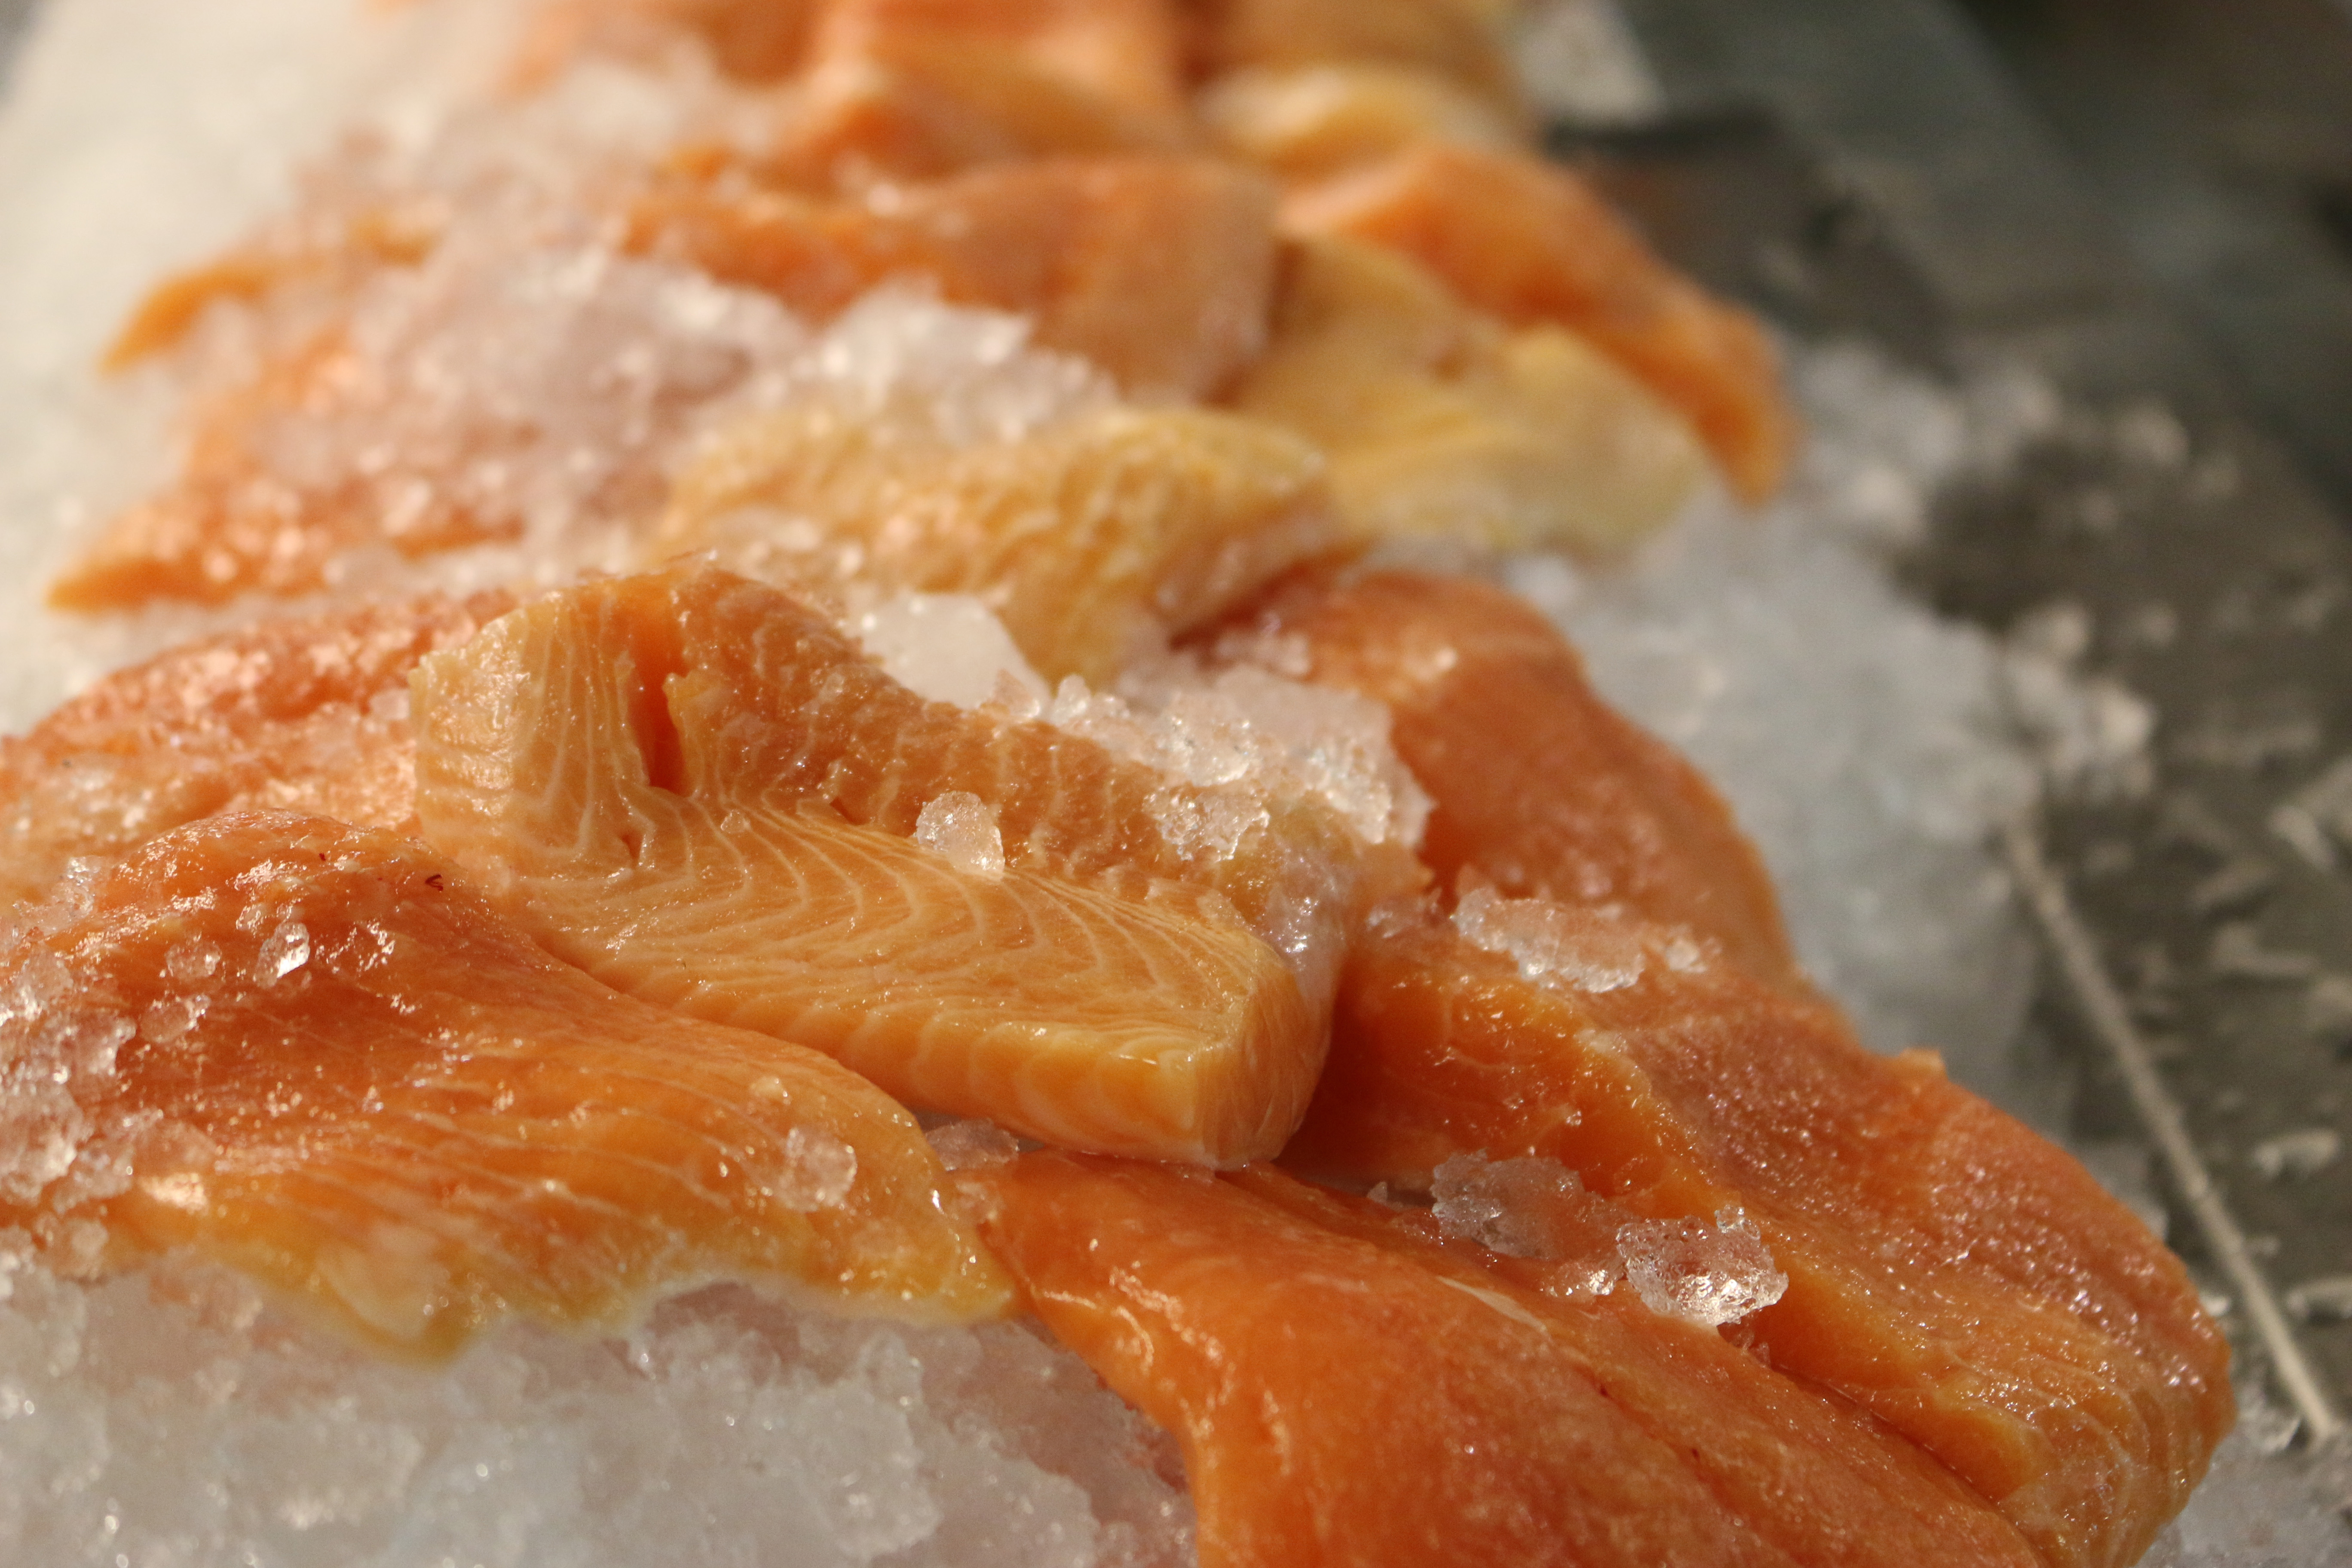 Fresh Salmon over Ice